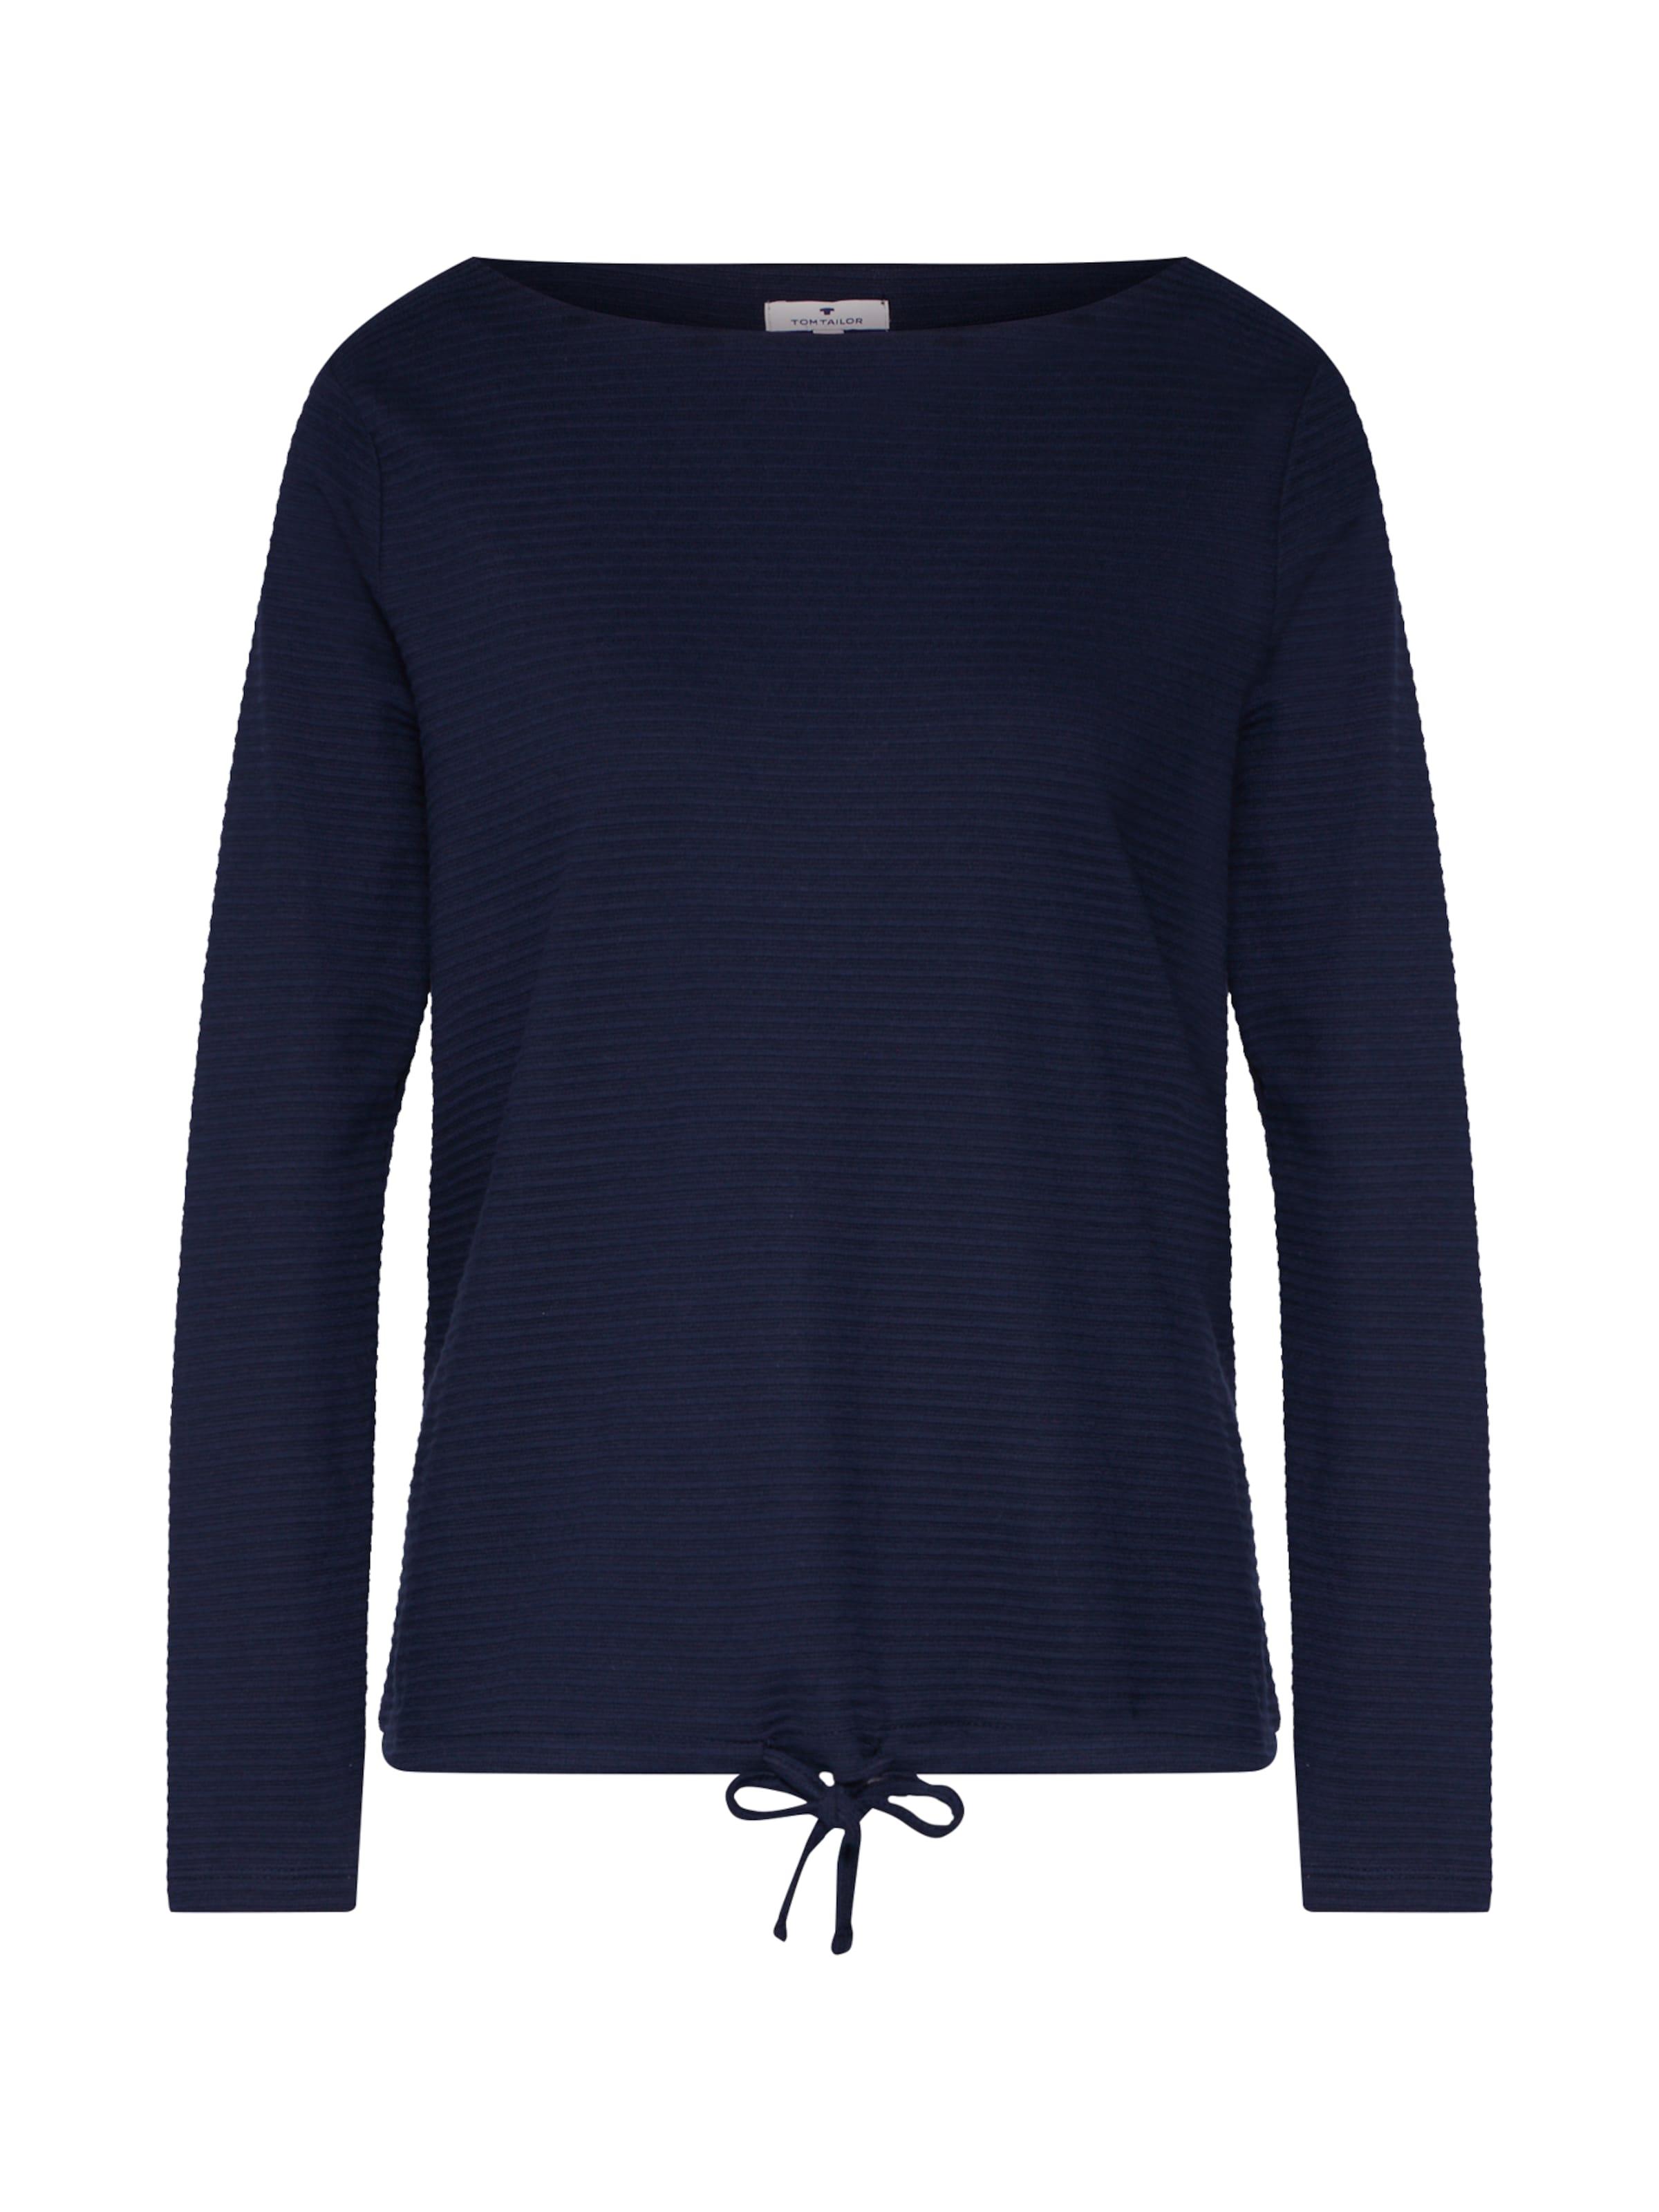 Sweatshirt Dunkelblau In Sweatshirt Tailor Tailor In Tom Tom Sweatshirt Tailor Tom Dunkelblau 0XOwPk8n